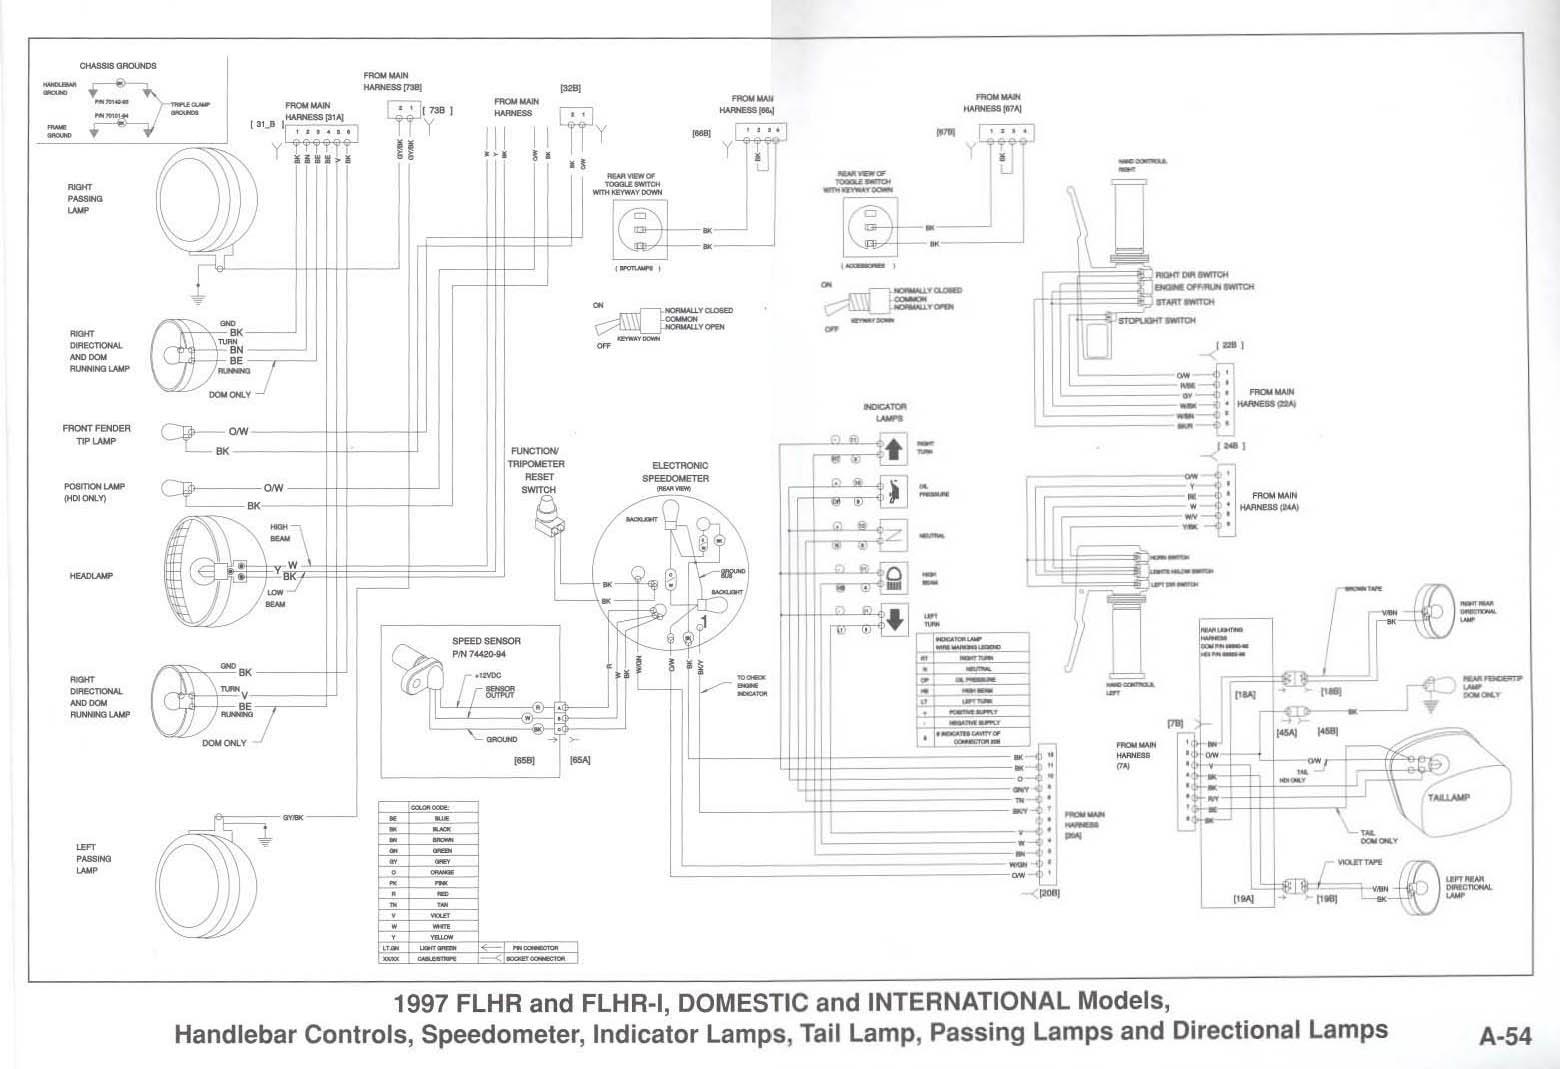 DIAGRAM] 2013 Harley Davidson Street Bob Wiring Diagram FULL Version HD  Quality Wiring Diagram - PHDIAGRAM.DAVIDECALIGNANO.ITDiagram Database - davidecalignano.it